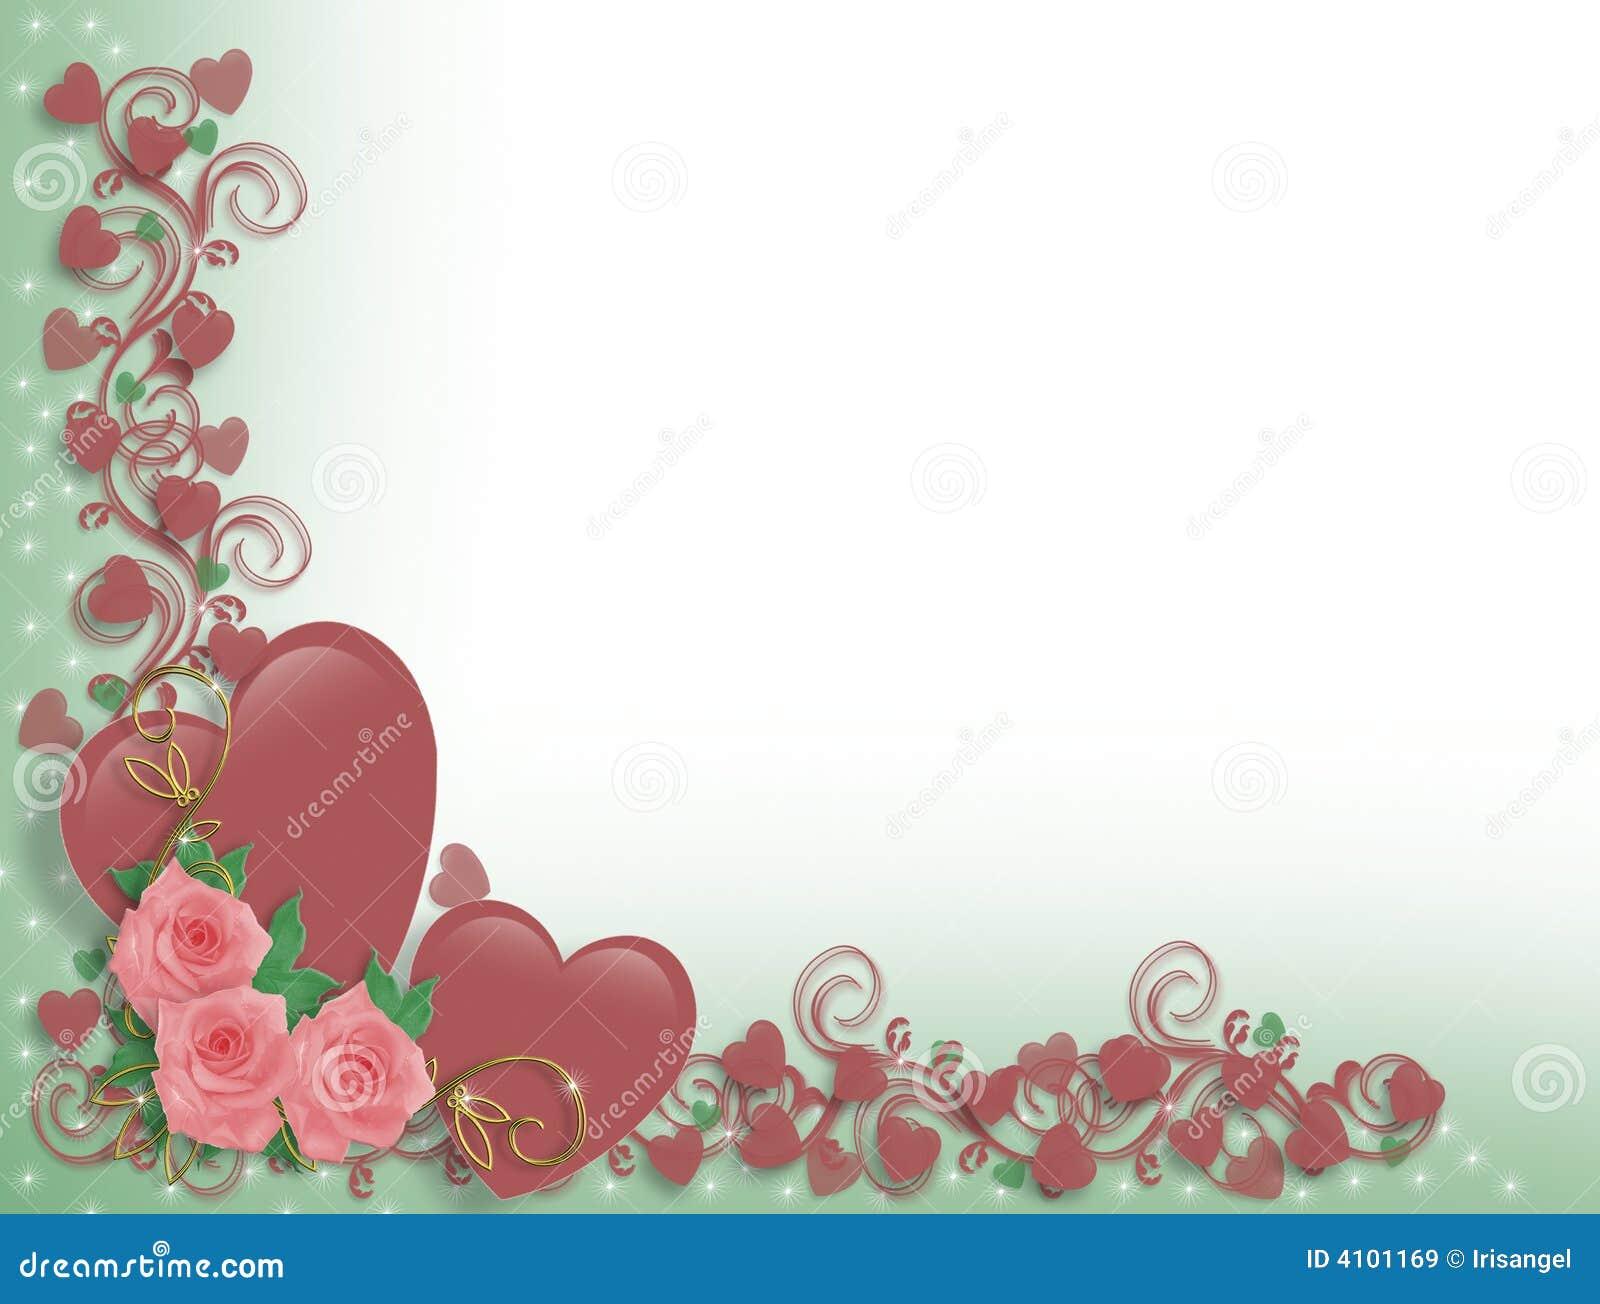 valentine or wedding hearts border royalty free stock